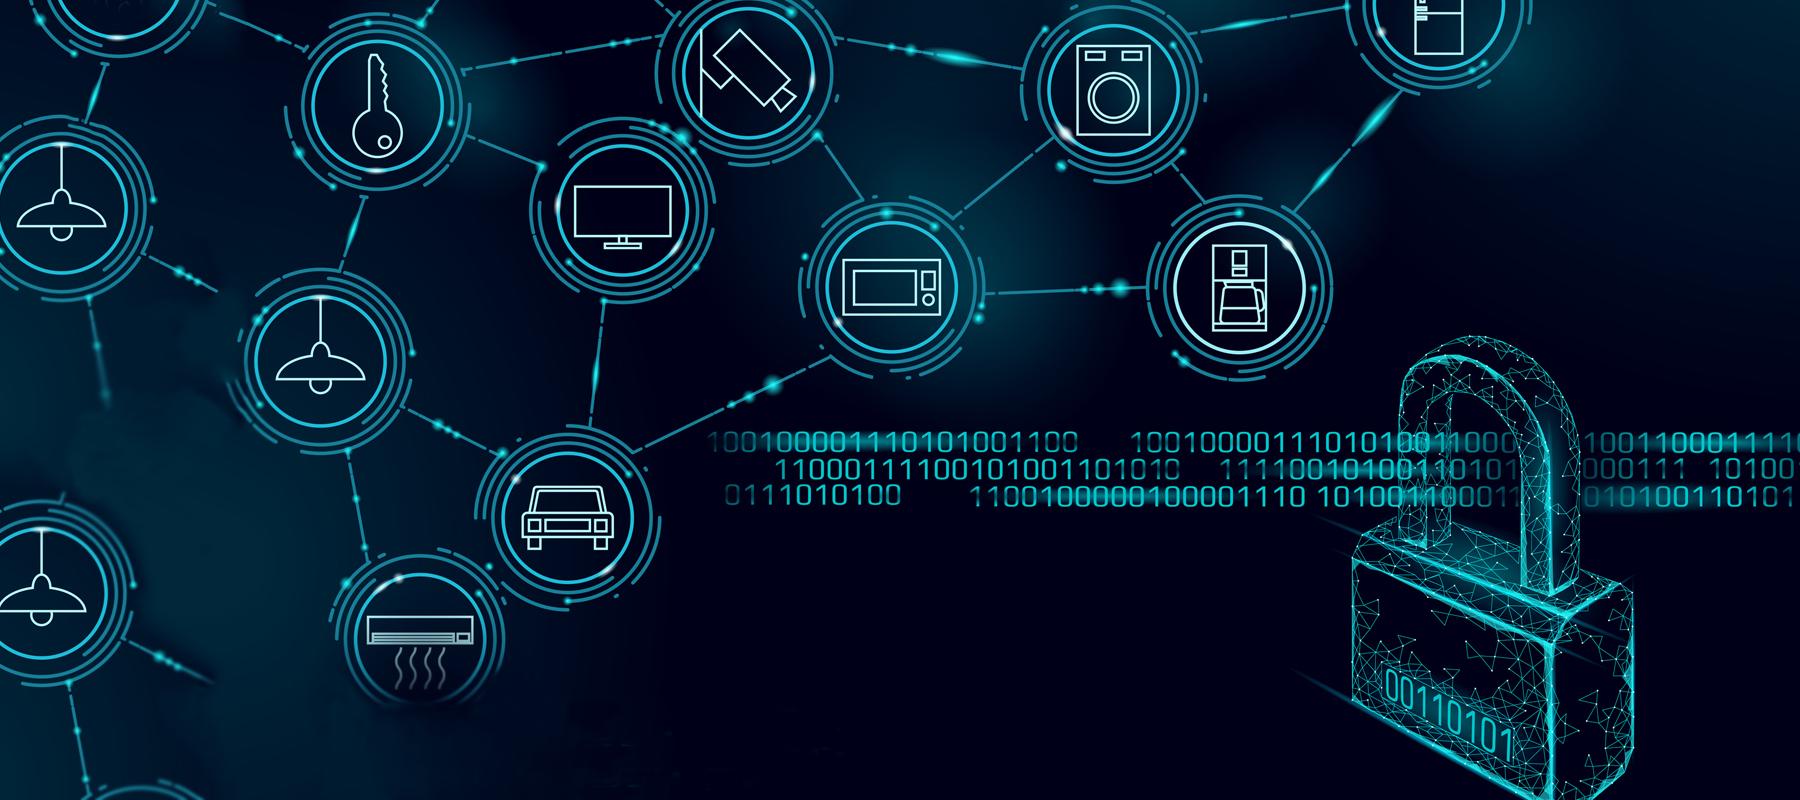 CyberSecurity Center_program image